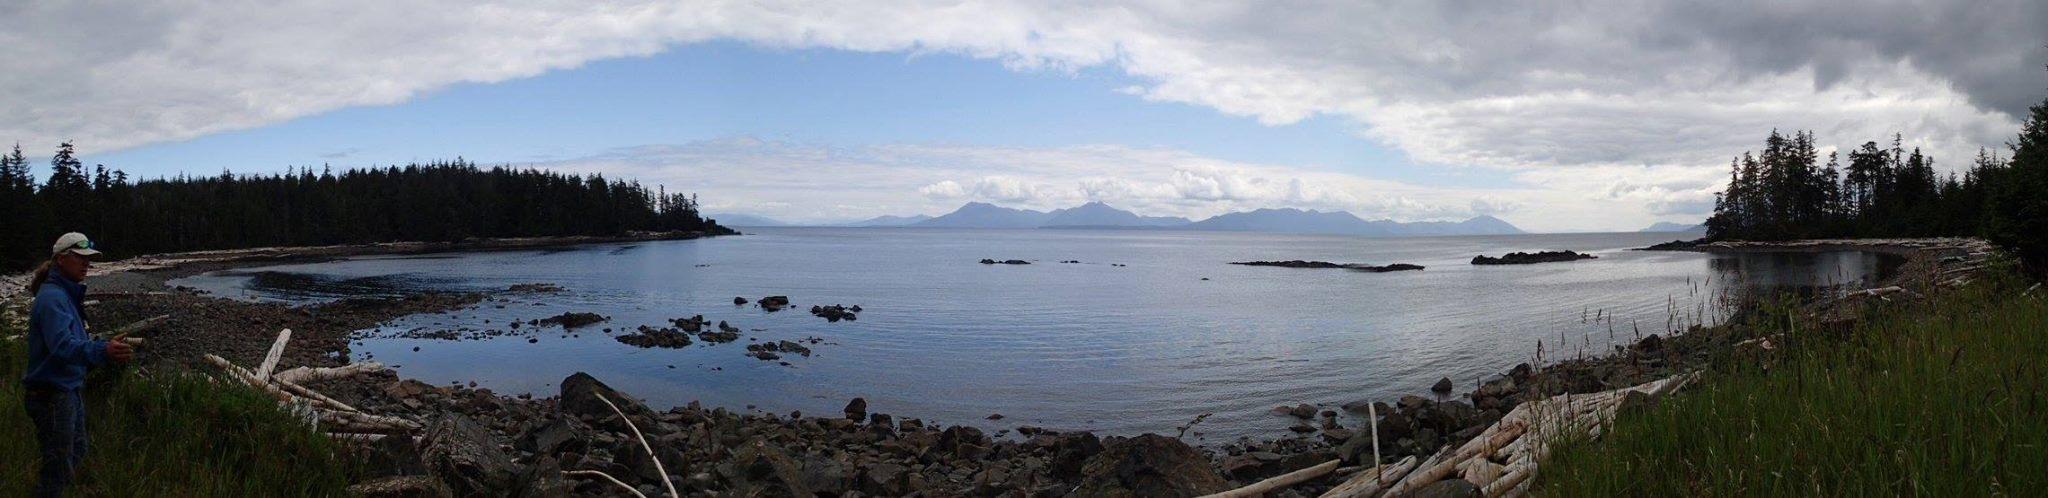 Alaskan star fishing rentals accommodations for Prince of wales island fishing